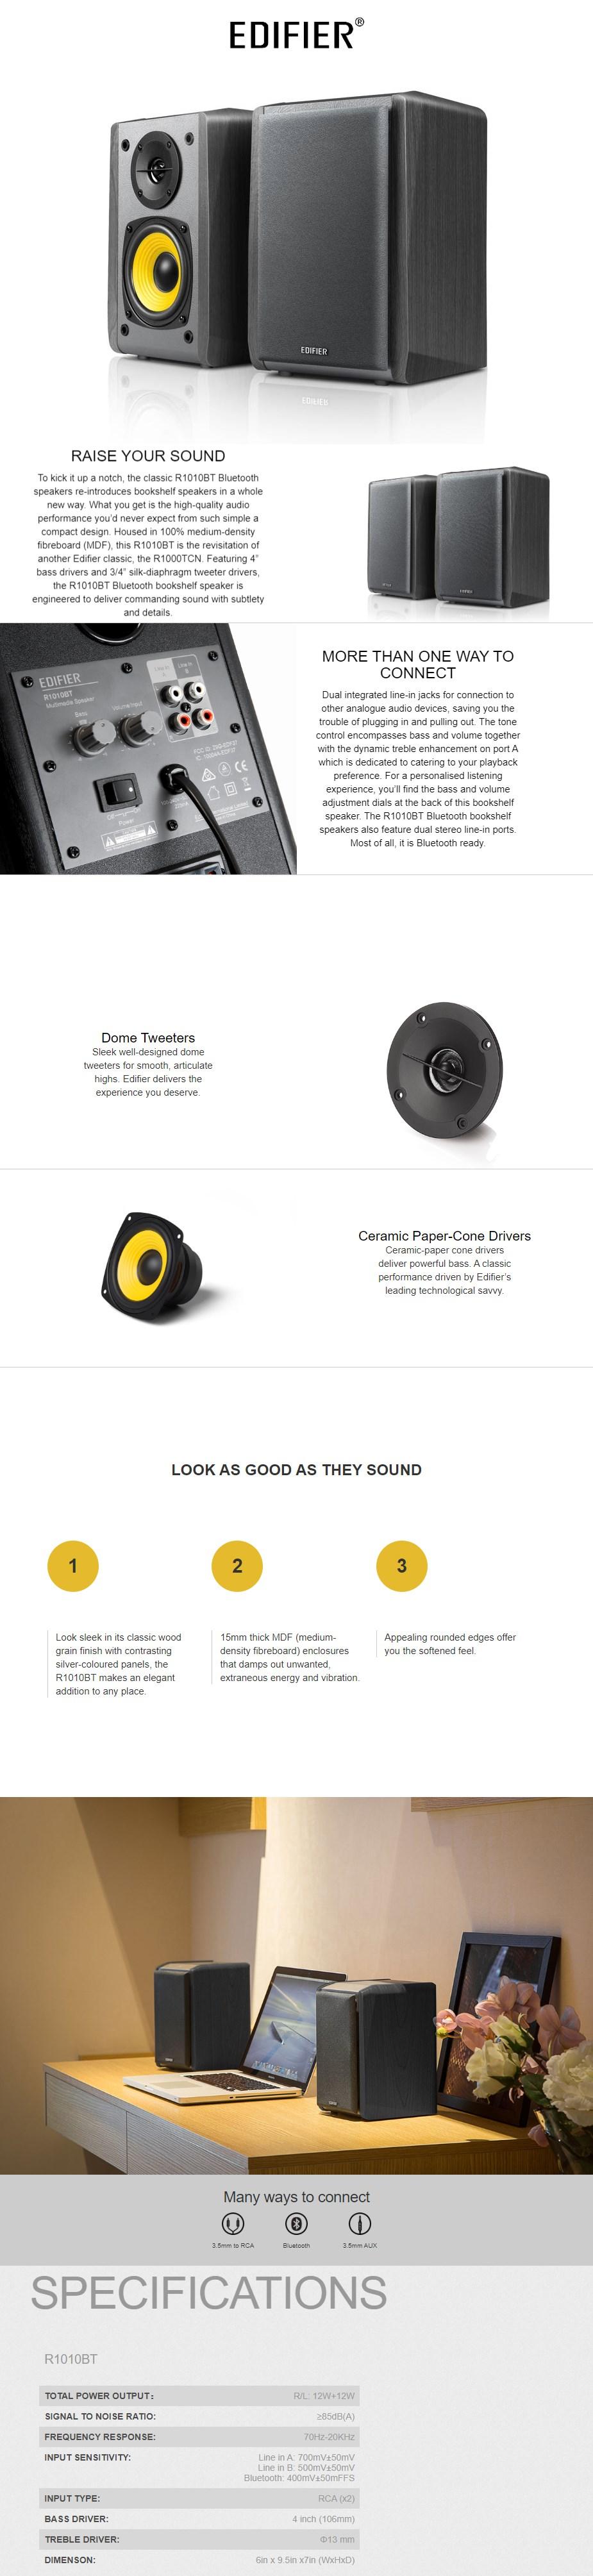 Edifier R1010BT 2.0 Bluetooth Studio Speakers - Brown - Overview 1